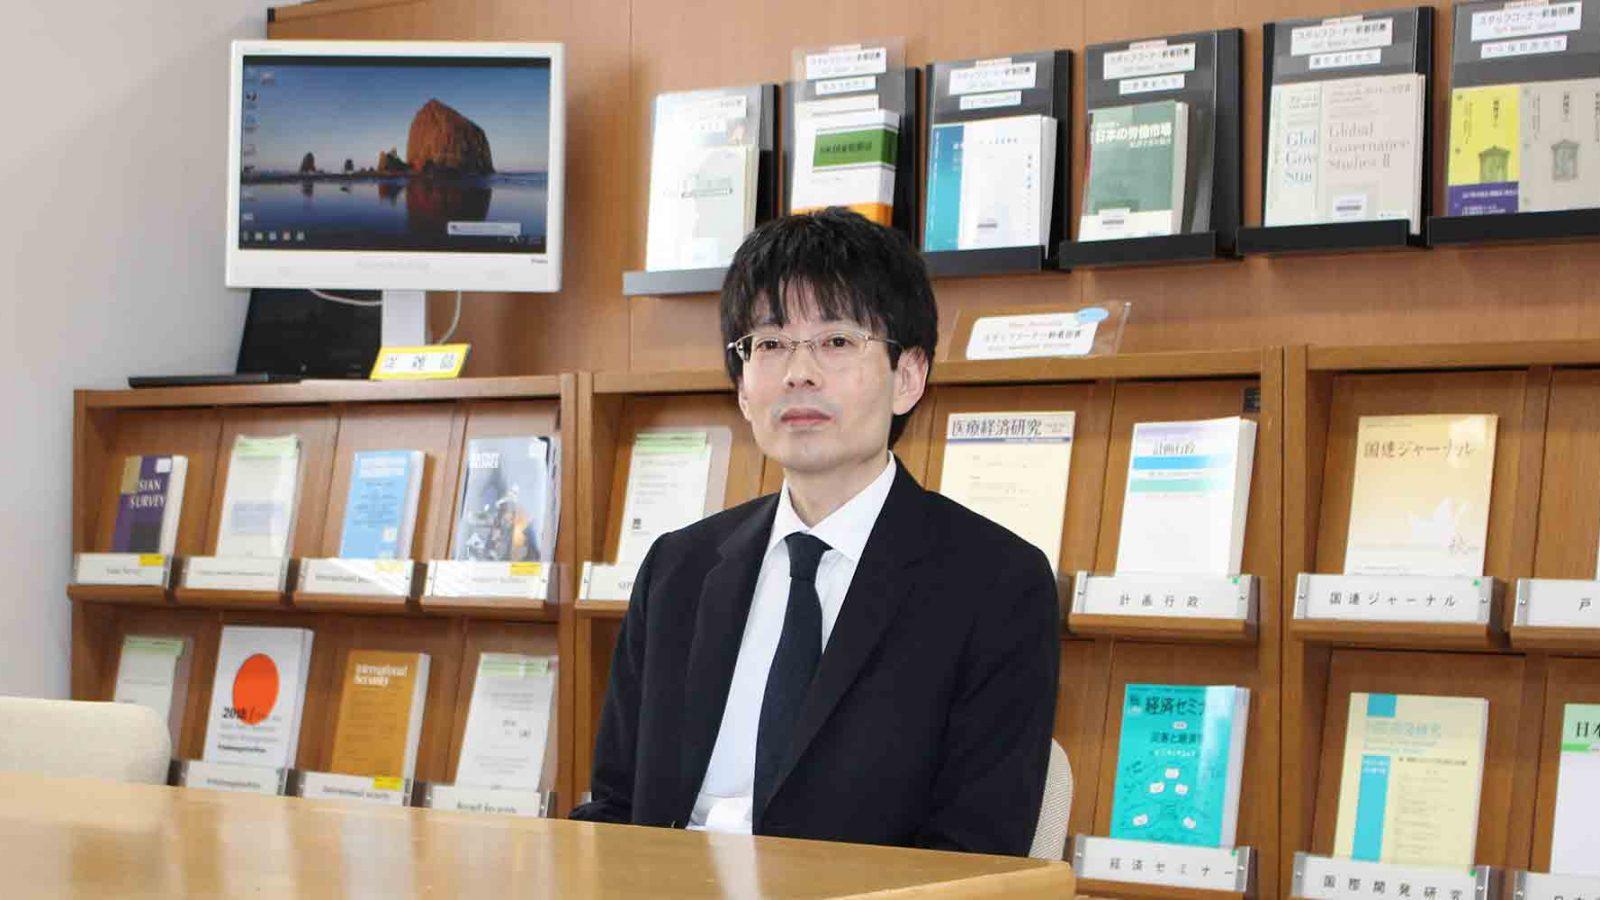 SAIRENJI-Takayuki-OSIPP-sensei